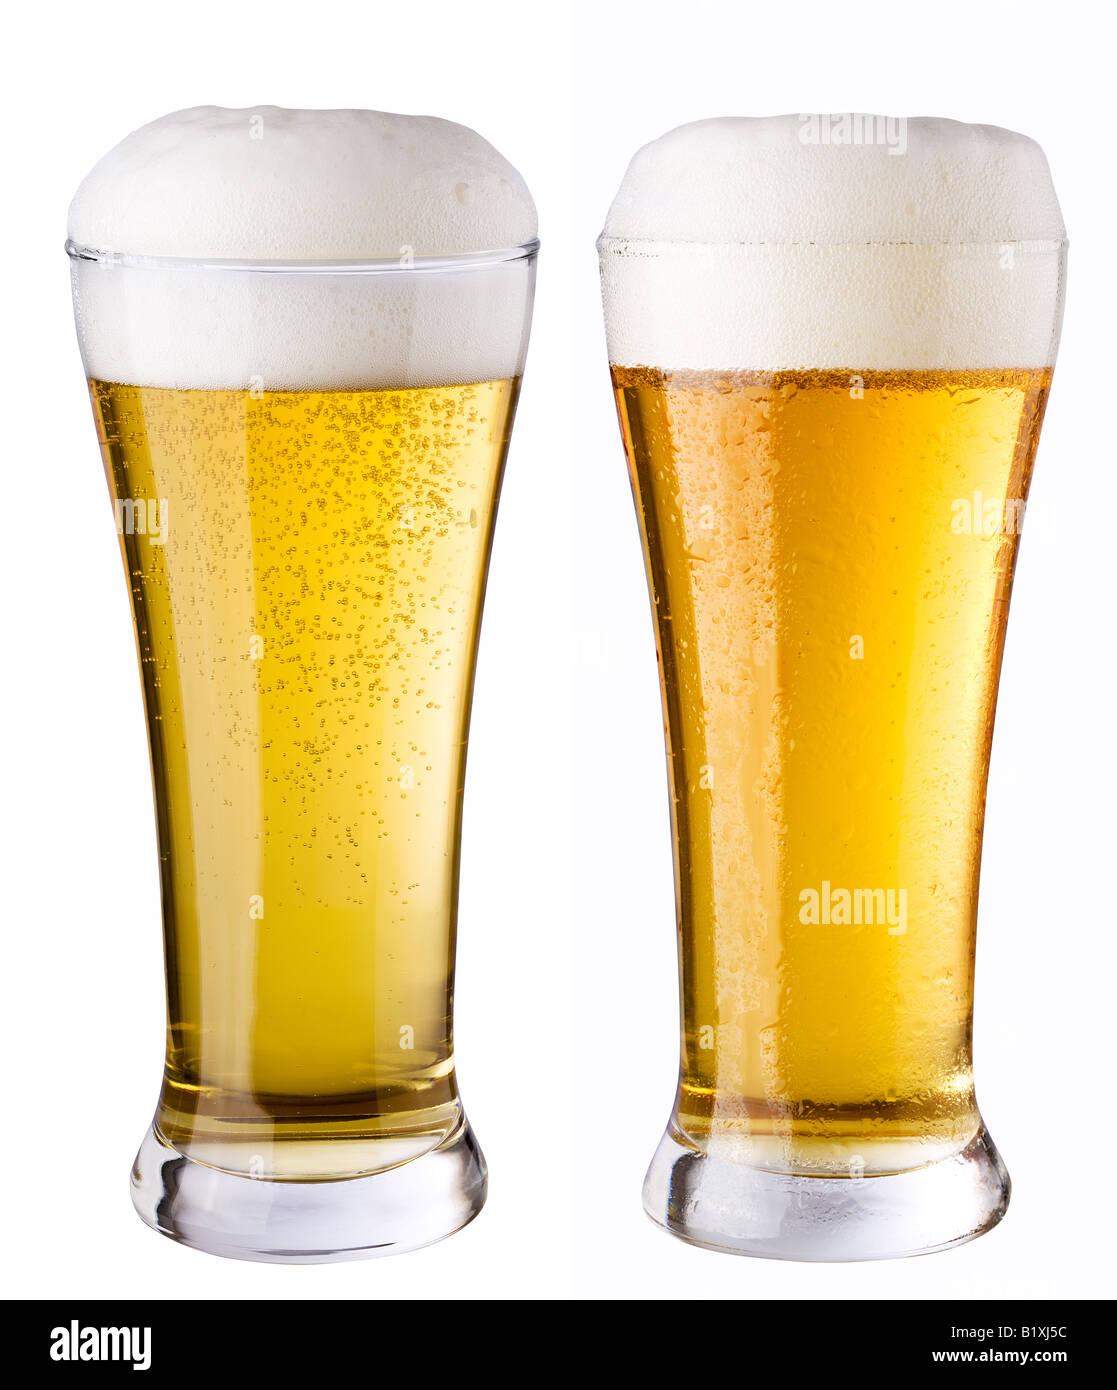 Light beer - Stock Image